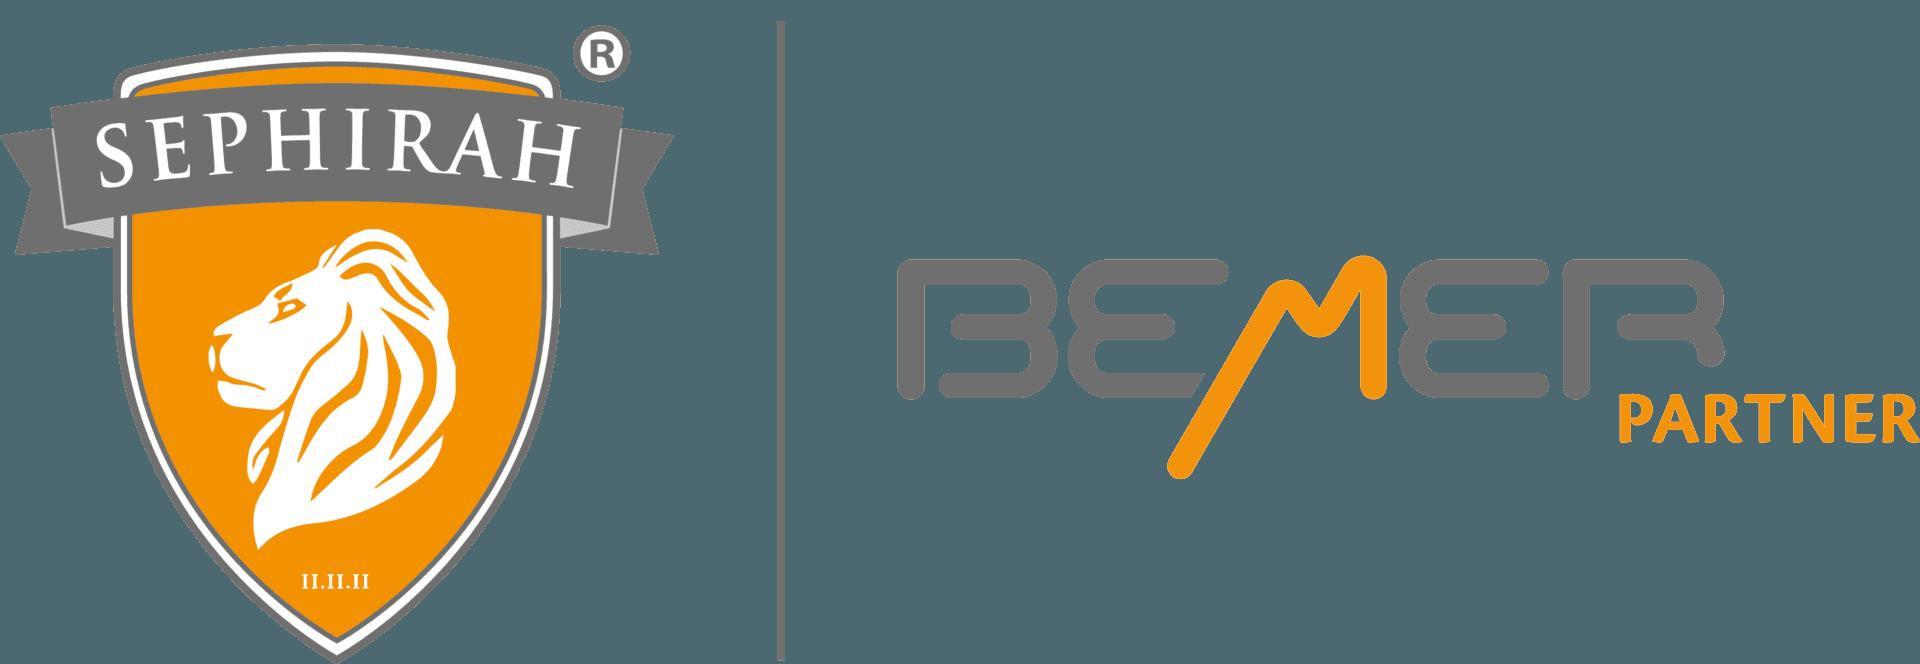 SEPHIRAH Int. GmbH